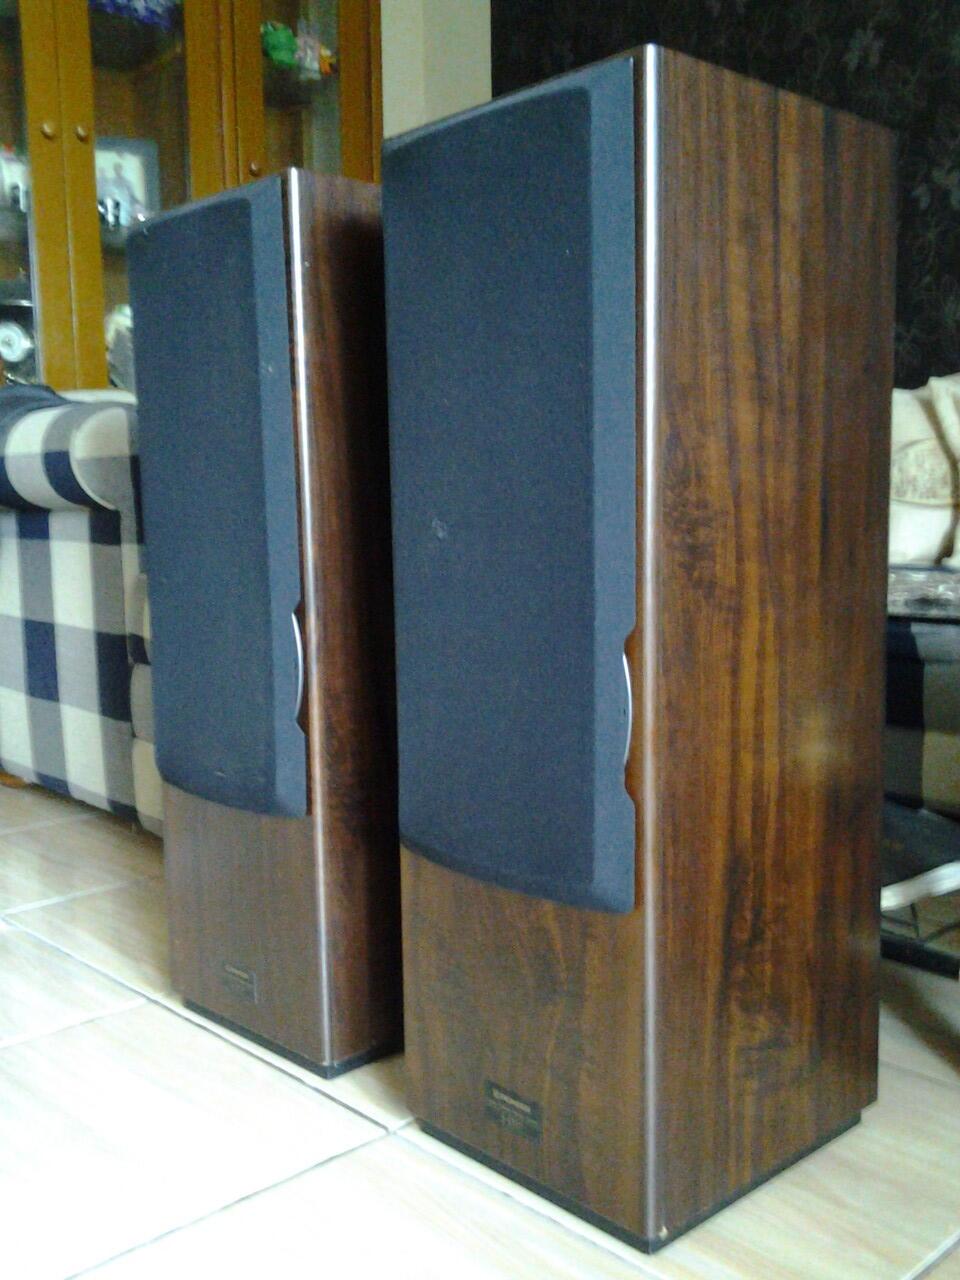 Speaker floorstanding Pioneer S-D77